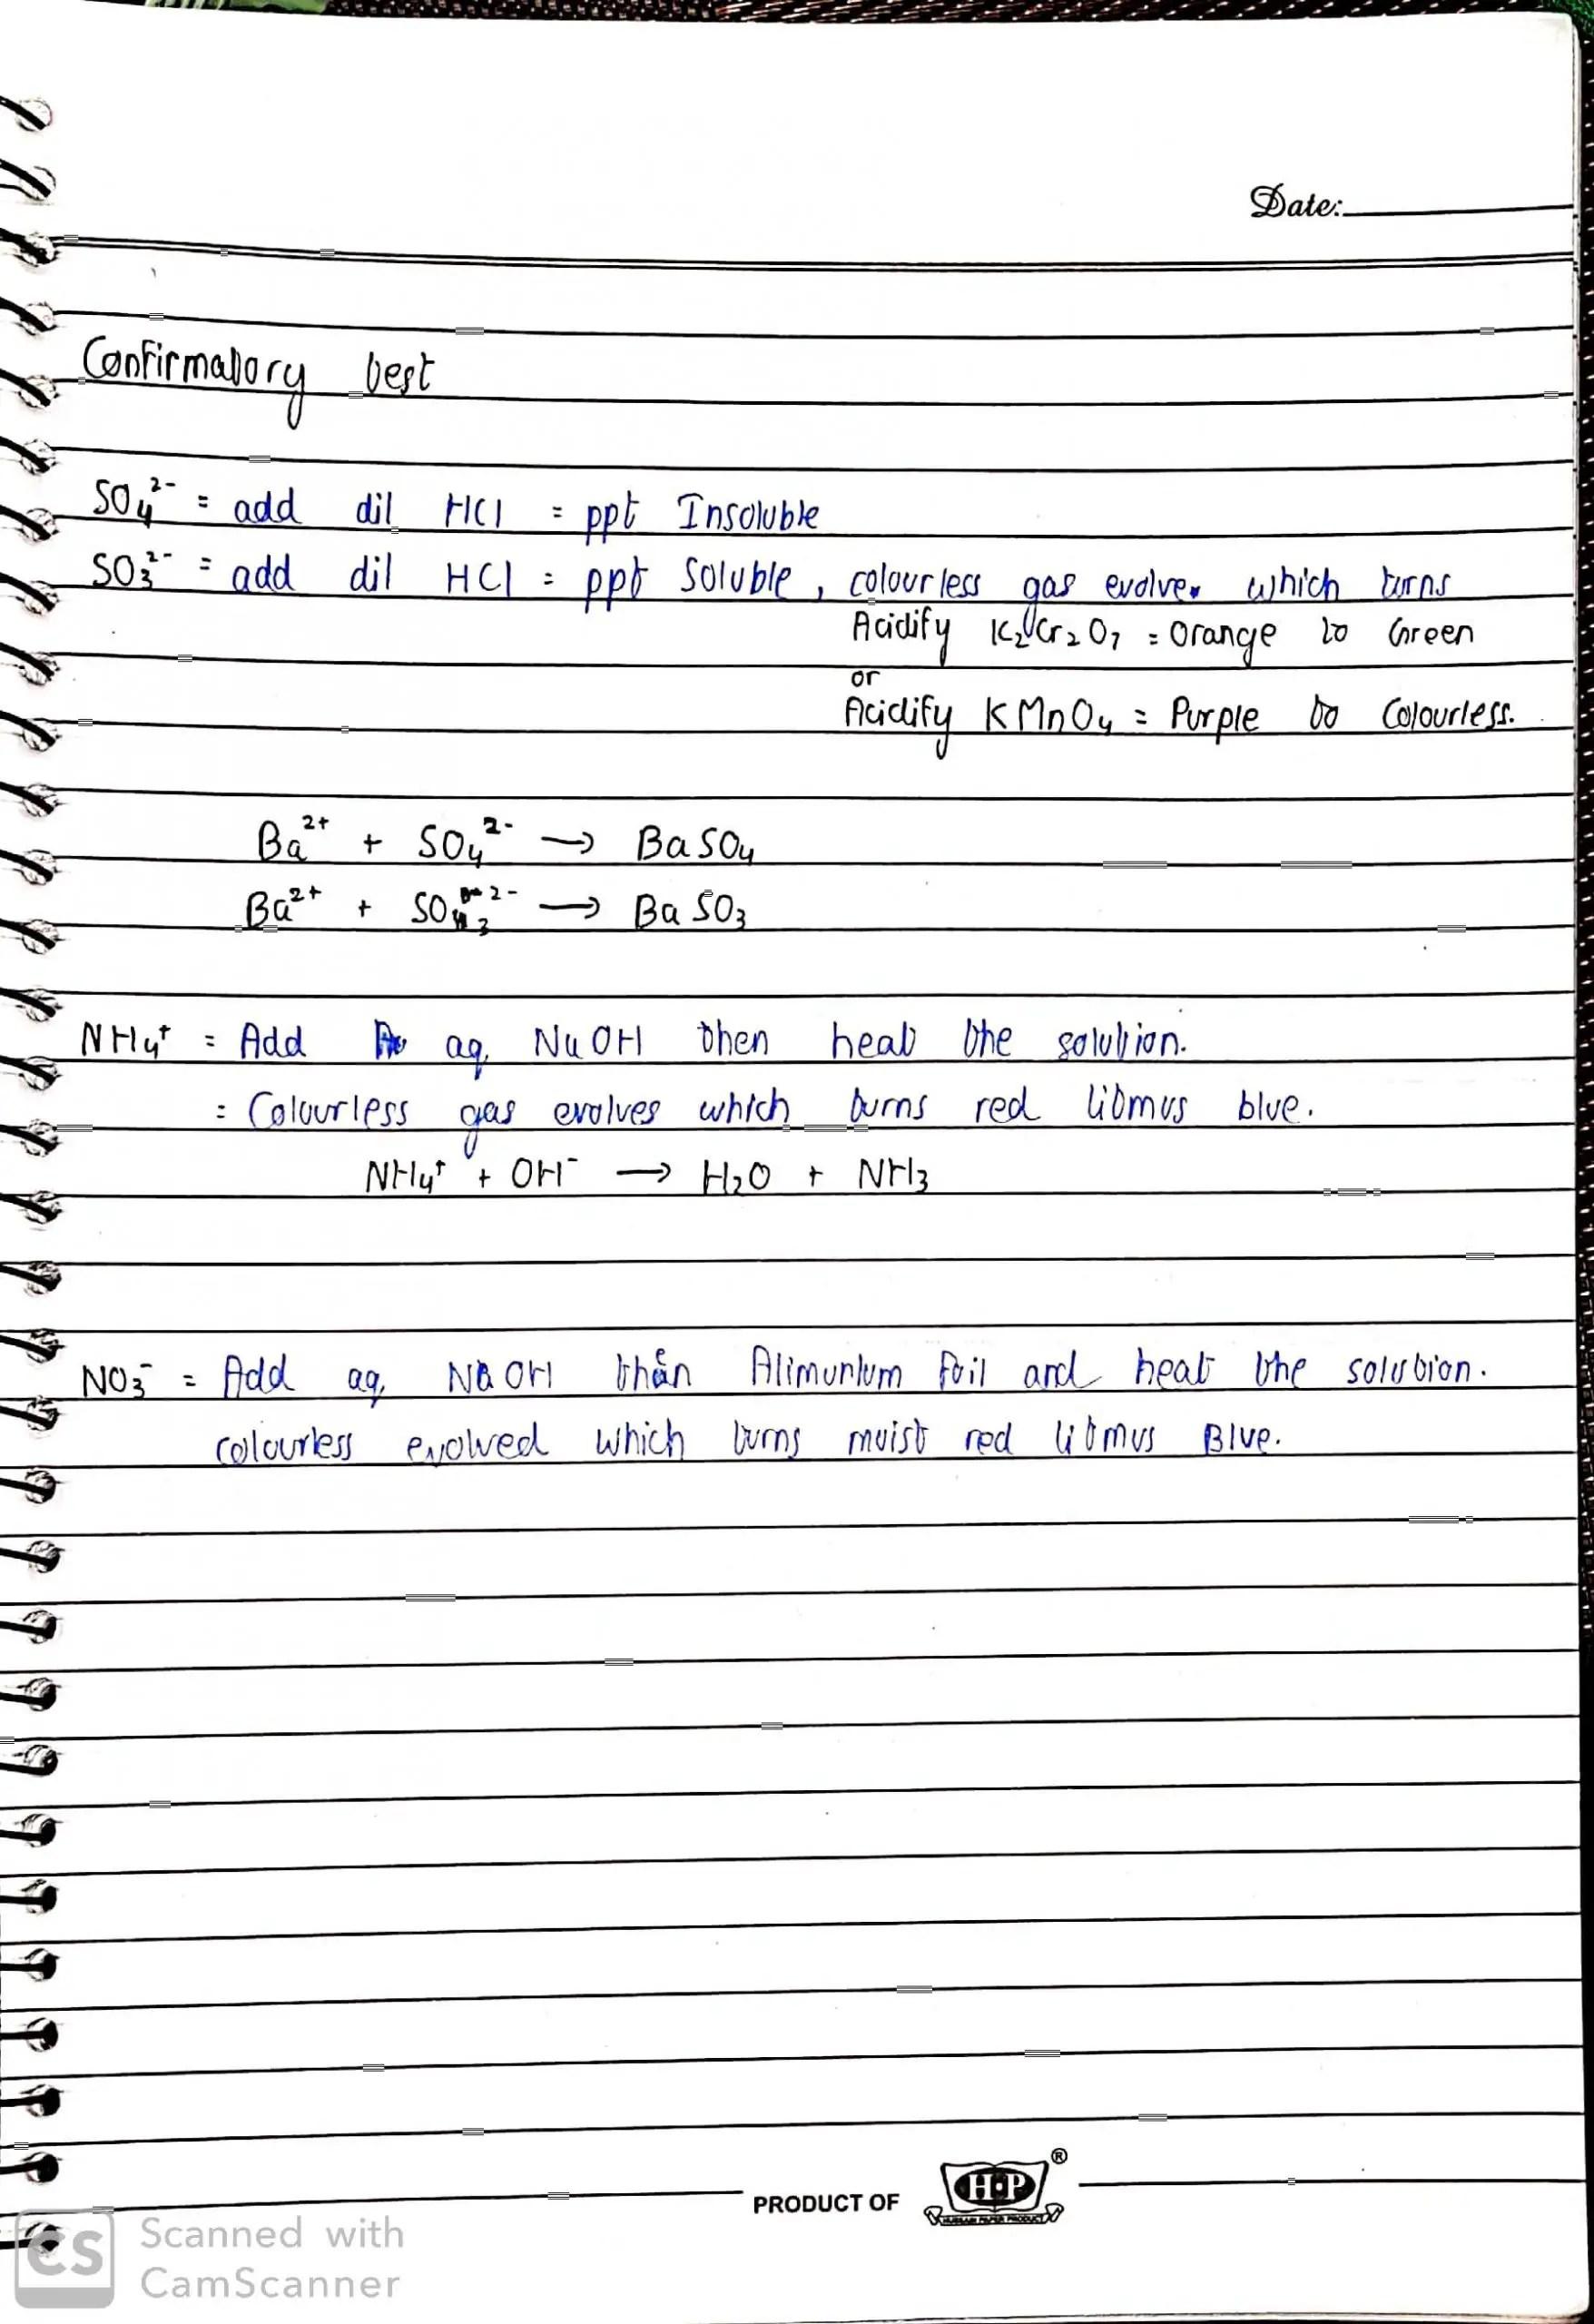 Olevel chem By sir Rizwan identification of ions_4